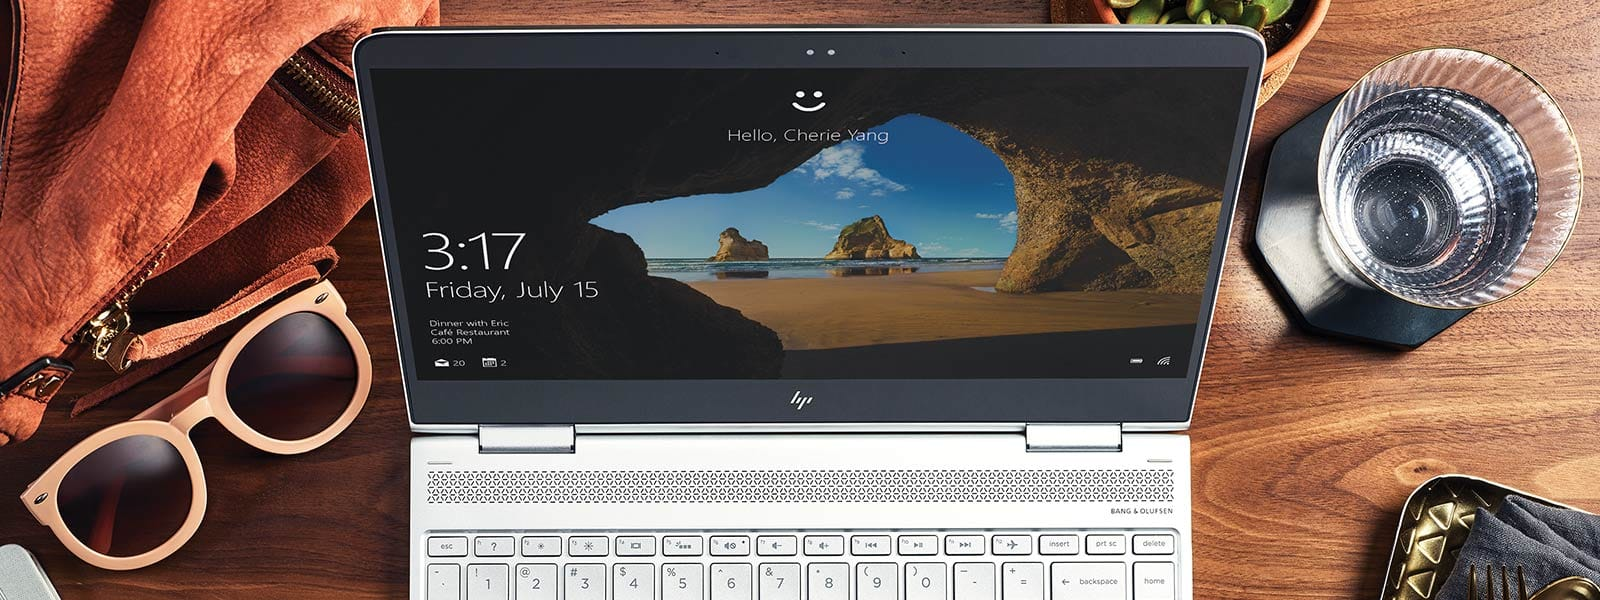 Windows 10 Start screen on a modern device.